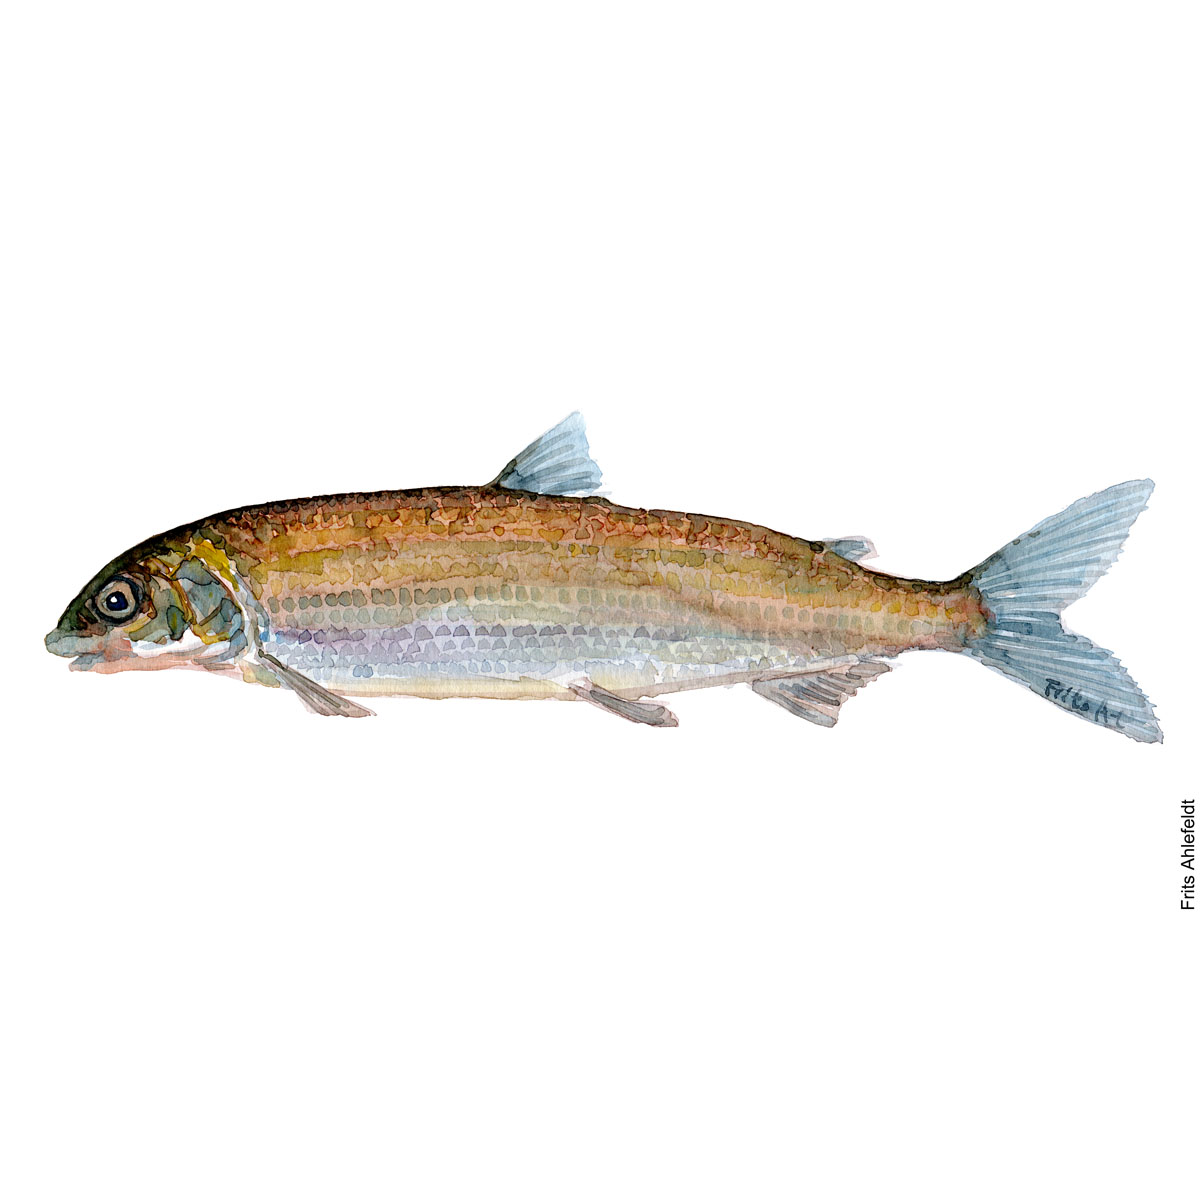 Whitefish Watercolour, Freshwater fish illustration by Frits Ahlefeldt